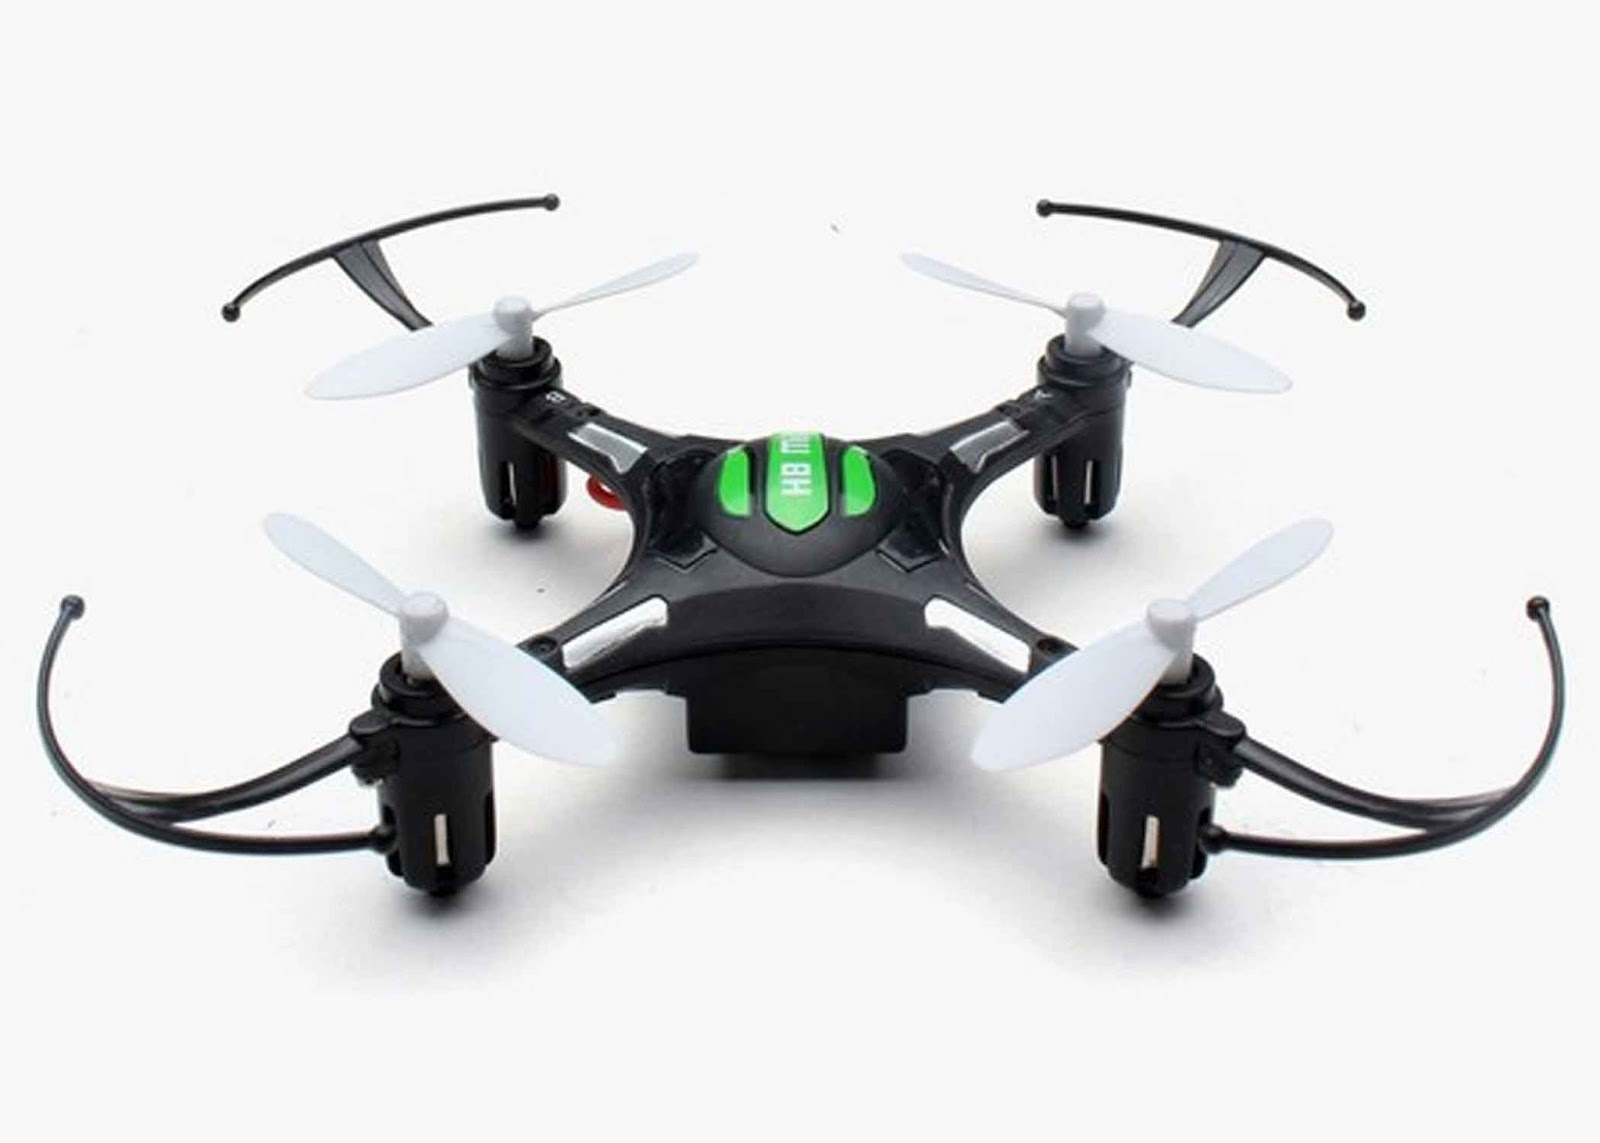 drone dji mavic pro price  | DJI S1000